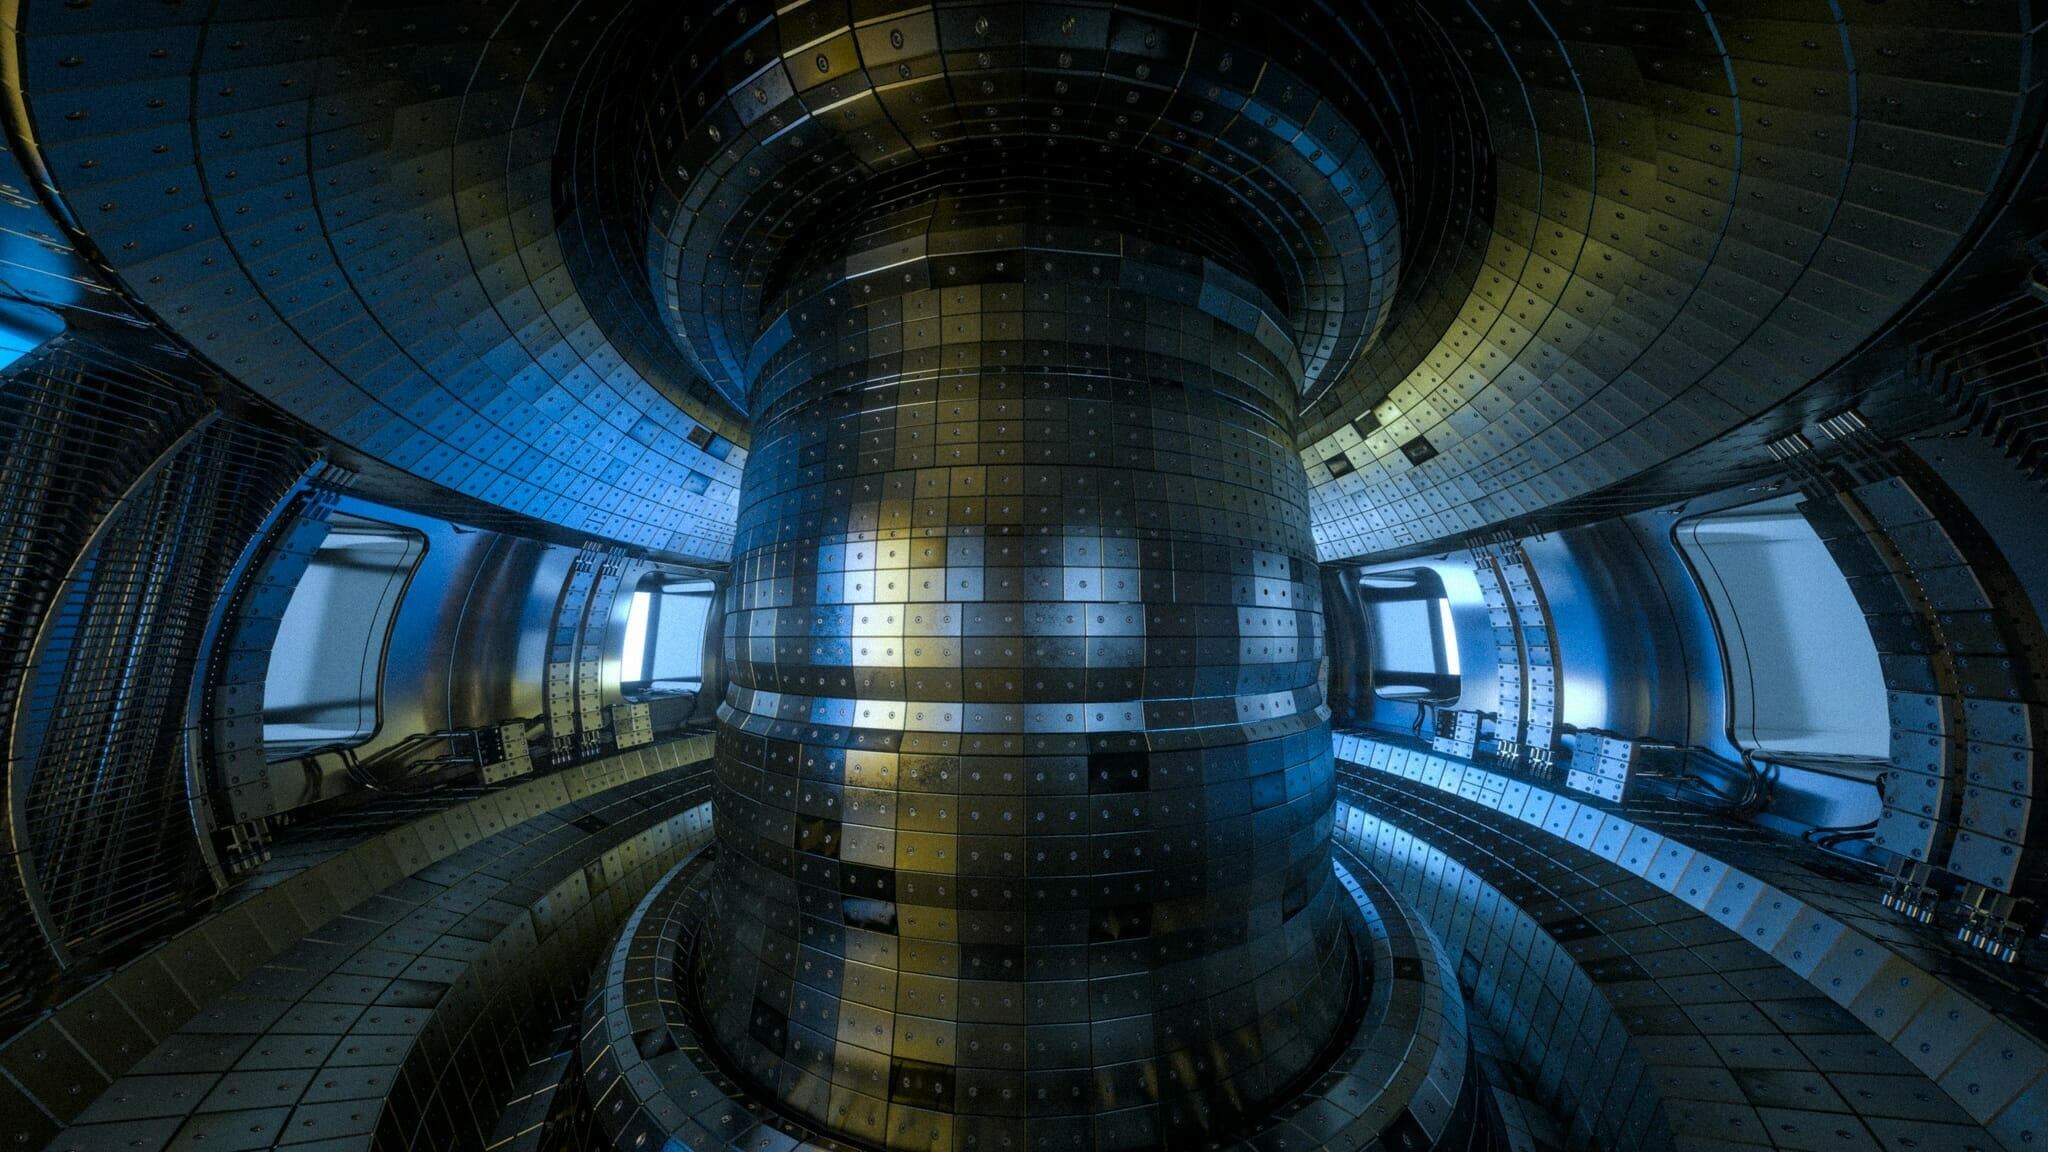 Fusion reactor Tokamak. Reaction chamber. Fusion power.